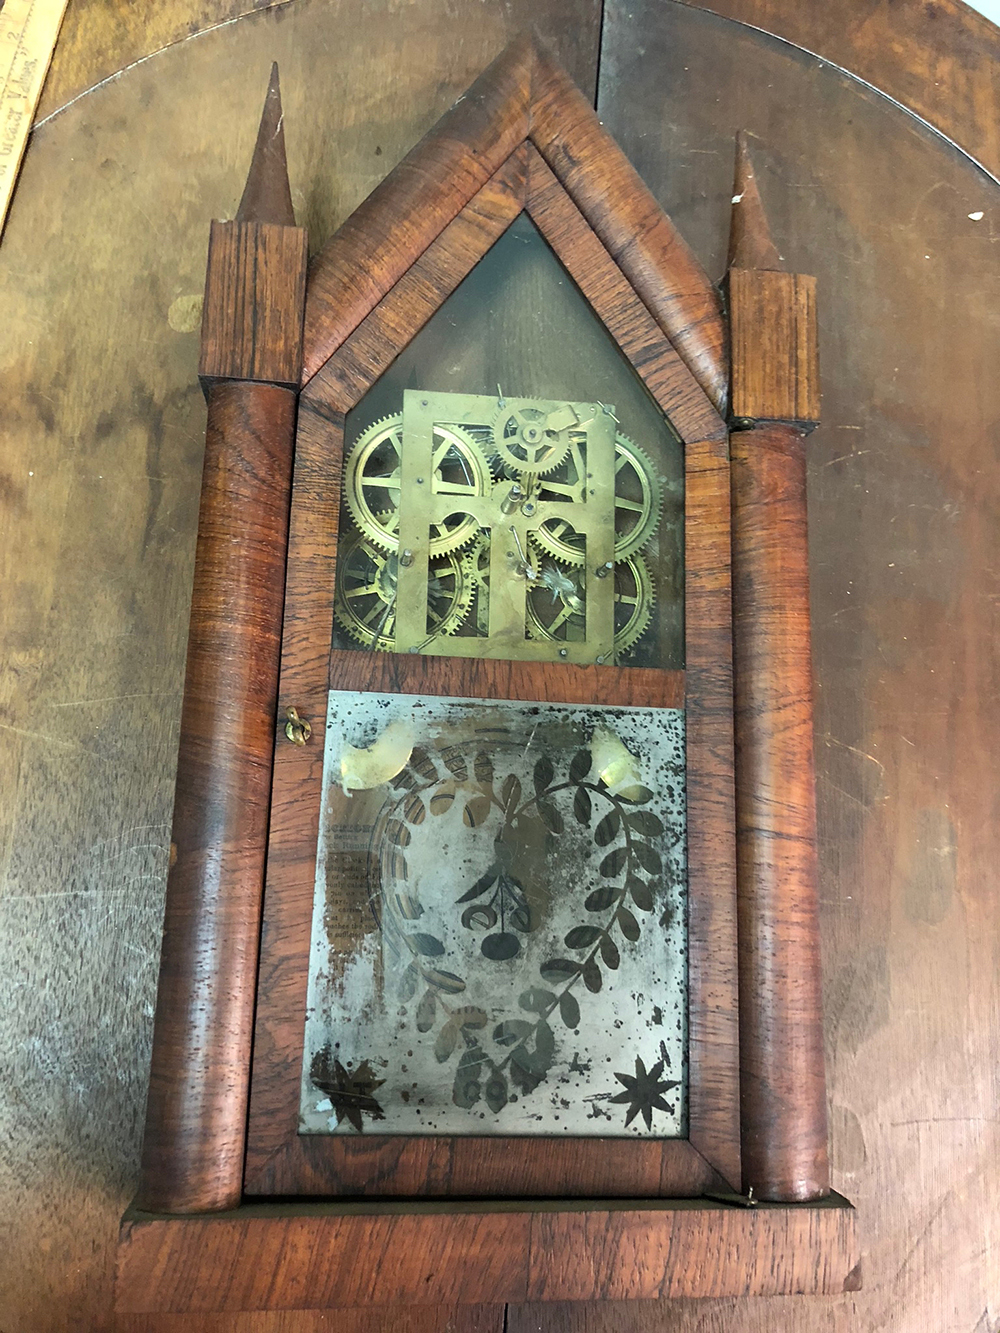 Smith and Goodrich Shelf Clock